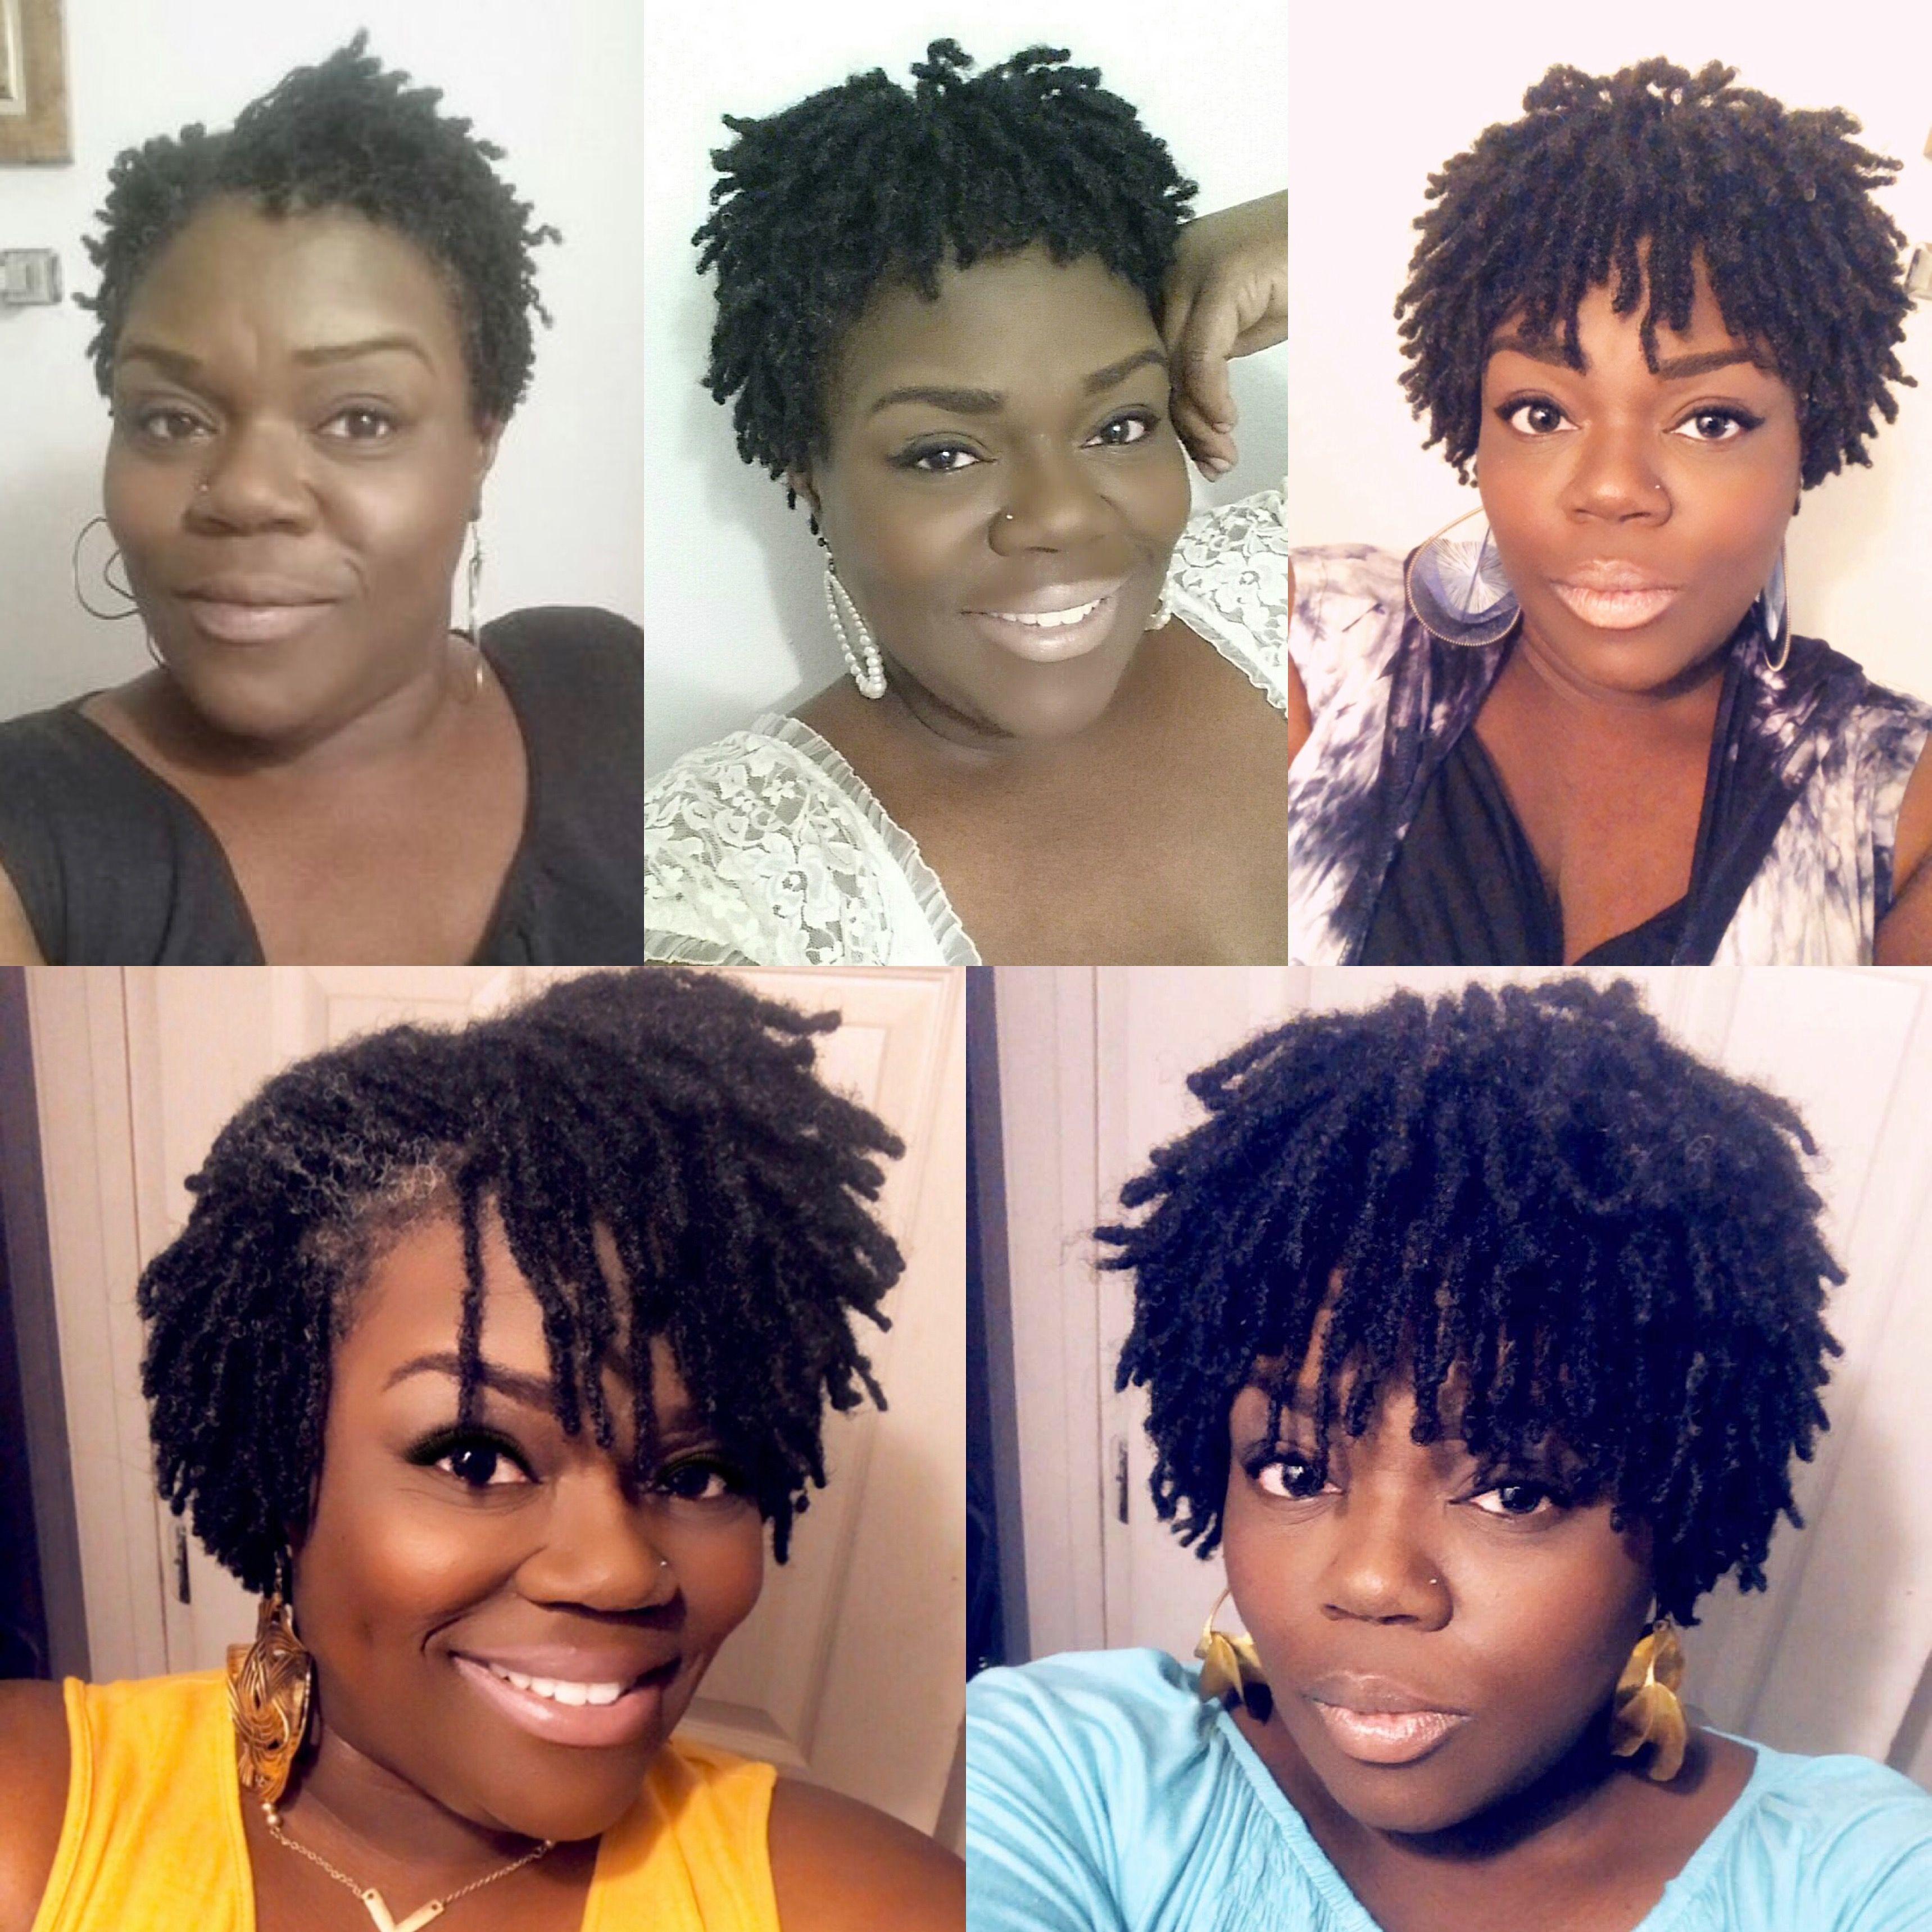 The Journey Sisterlocks Locs Locstyles Naturalhair Naturalhairstyles Womenwithlocs Ladieswi Short Hair Twist Styles Natural Hair Styles Locs Hairstyles